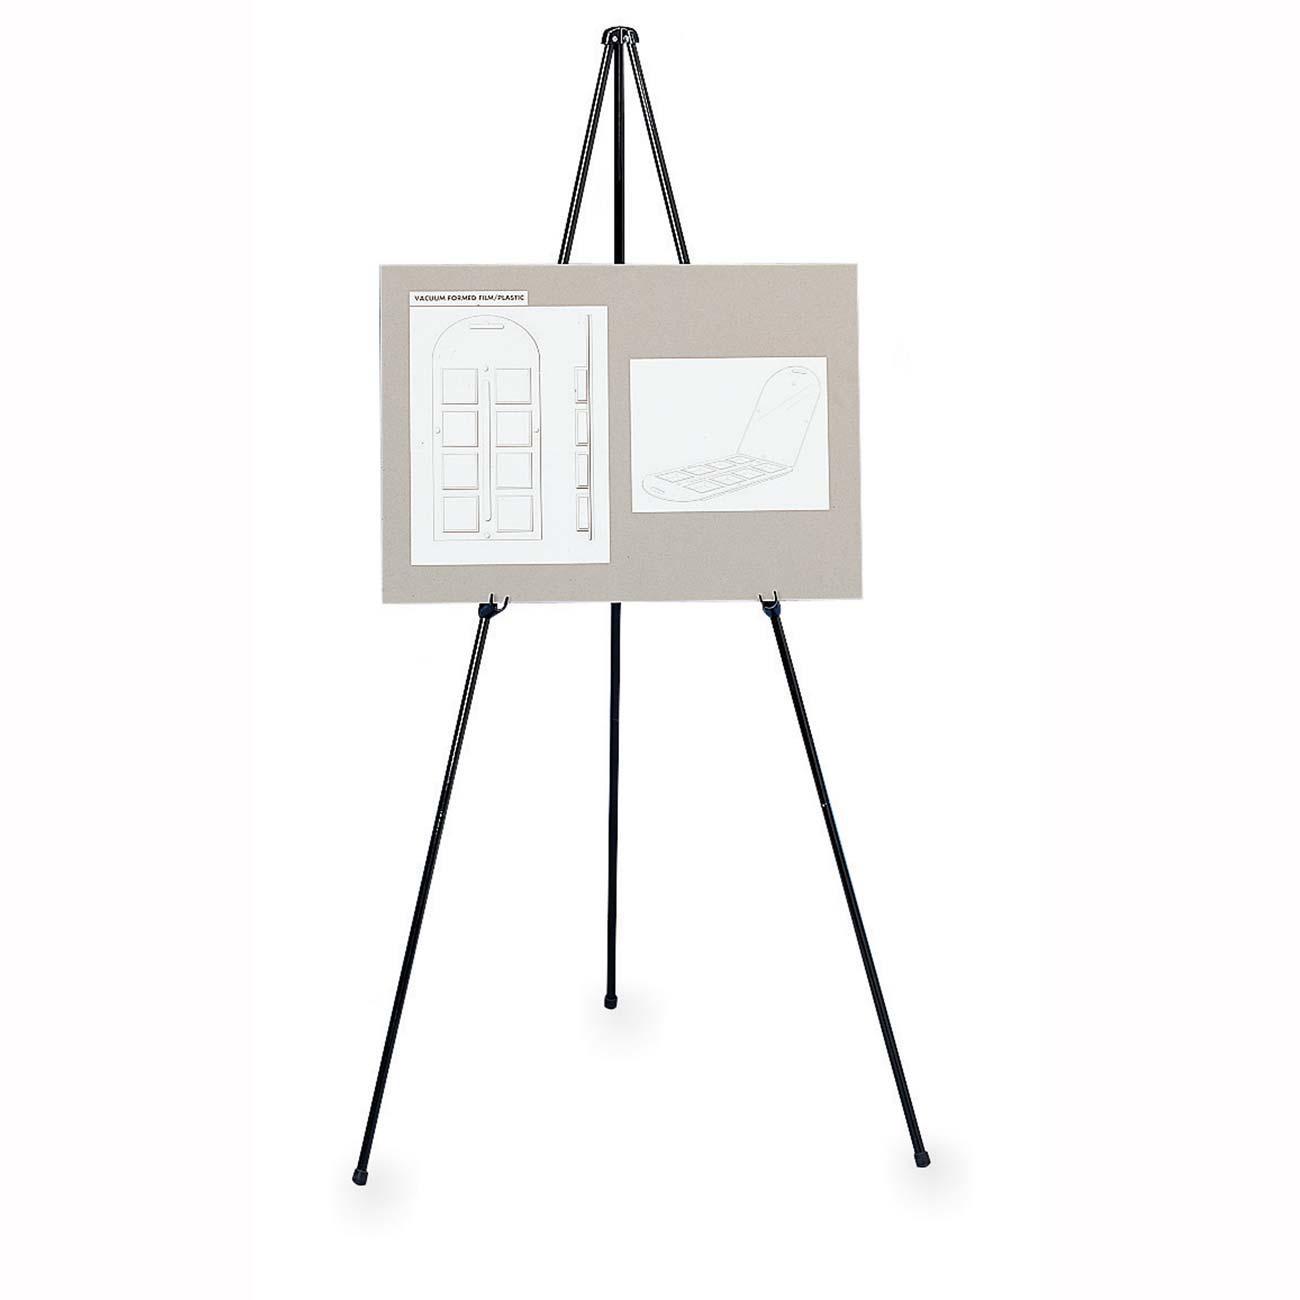 adjustable display folding easel stand